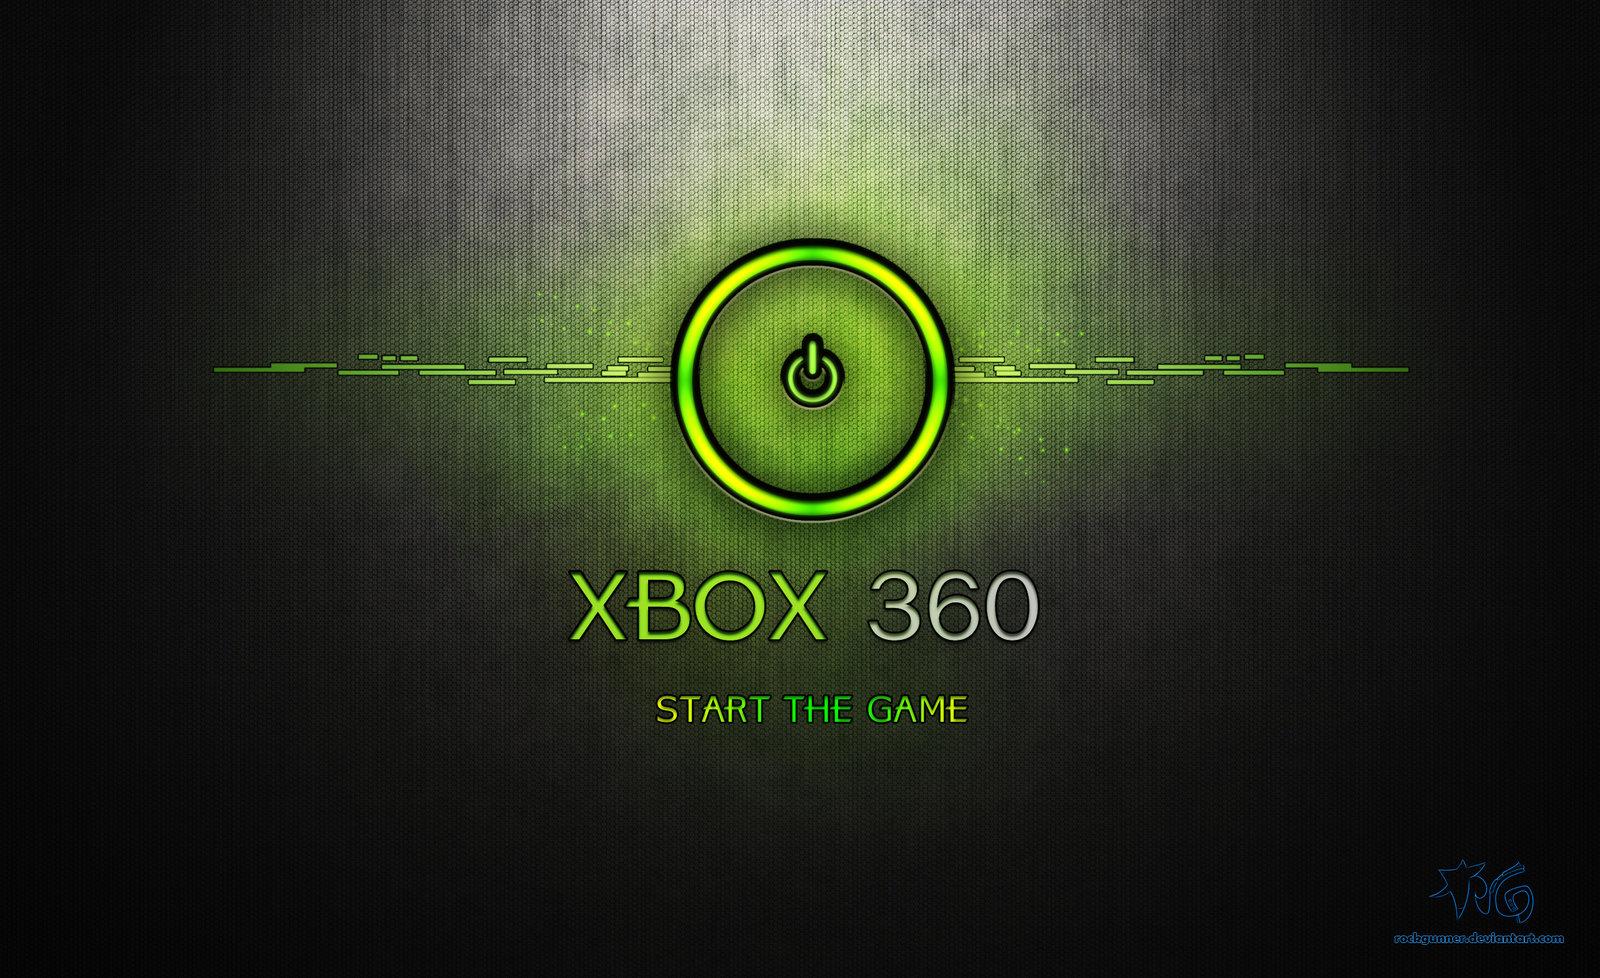 XBox 360 Wallpaper by ROCKGUNNER 1600x978